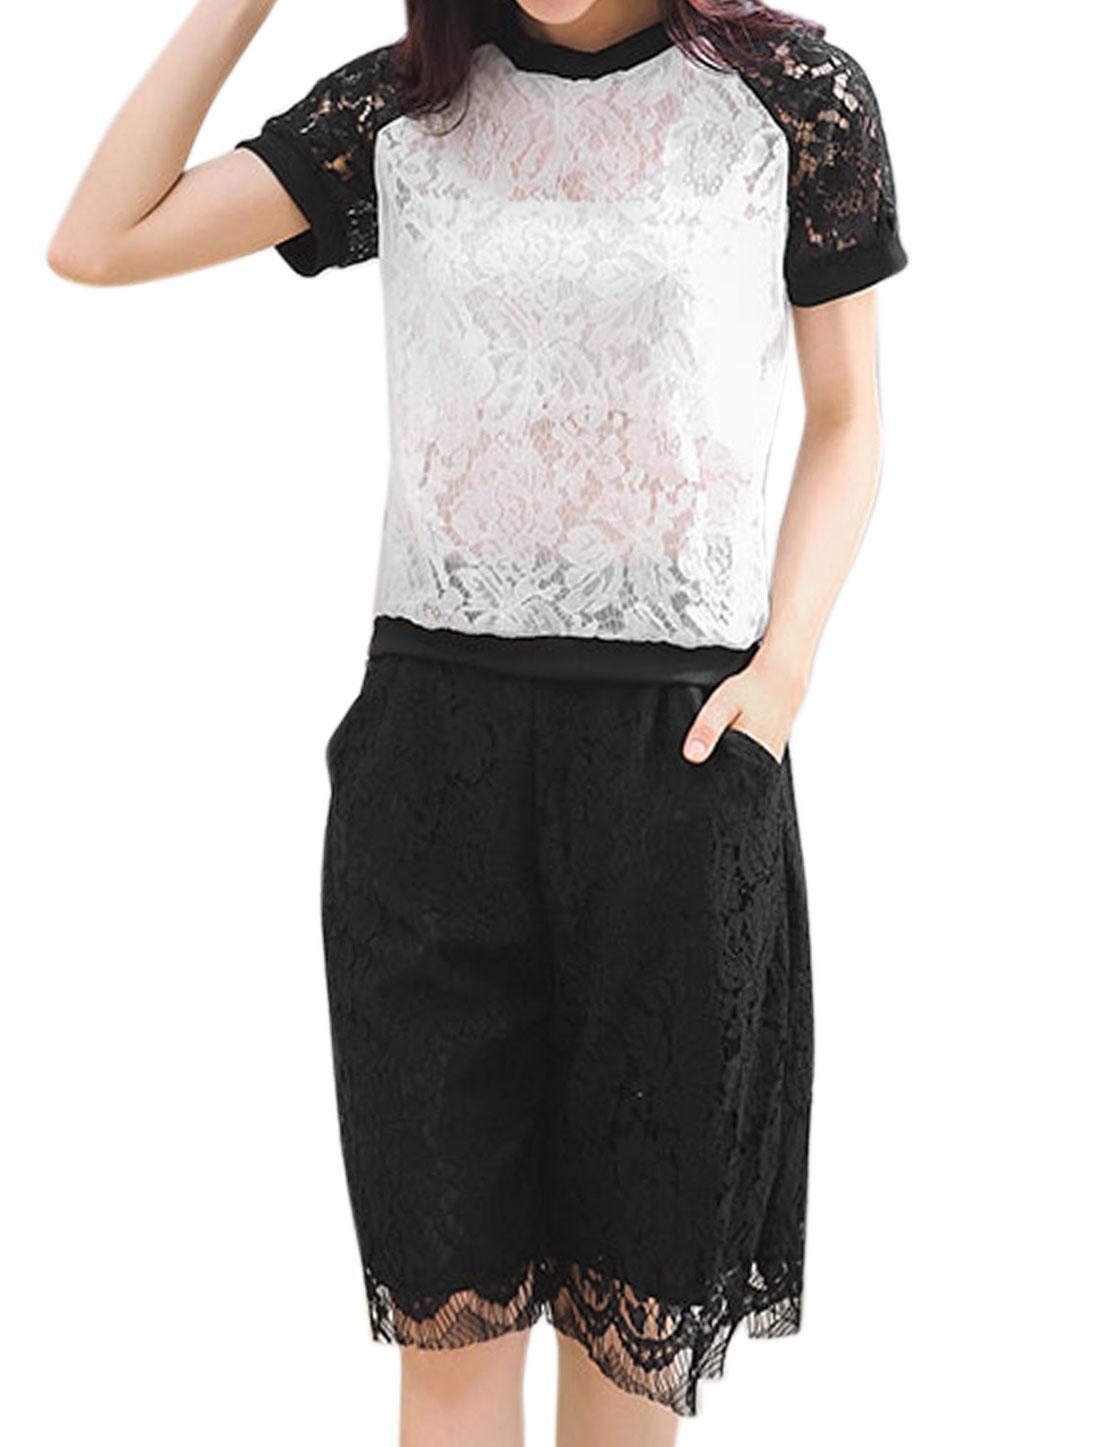 Women Organza Overlay Semi Sheer Tee w Wide Leg Lace Shorts Sets White M